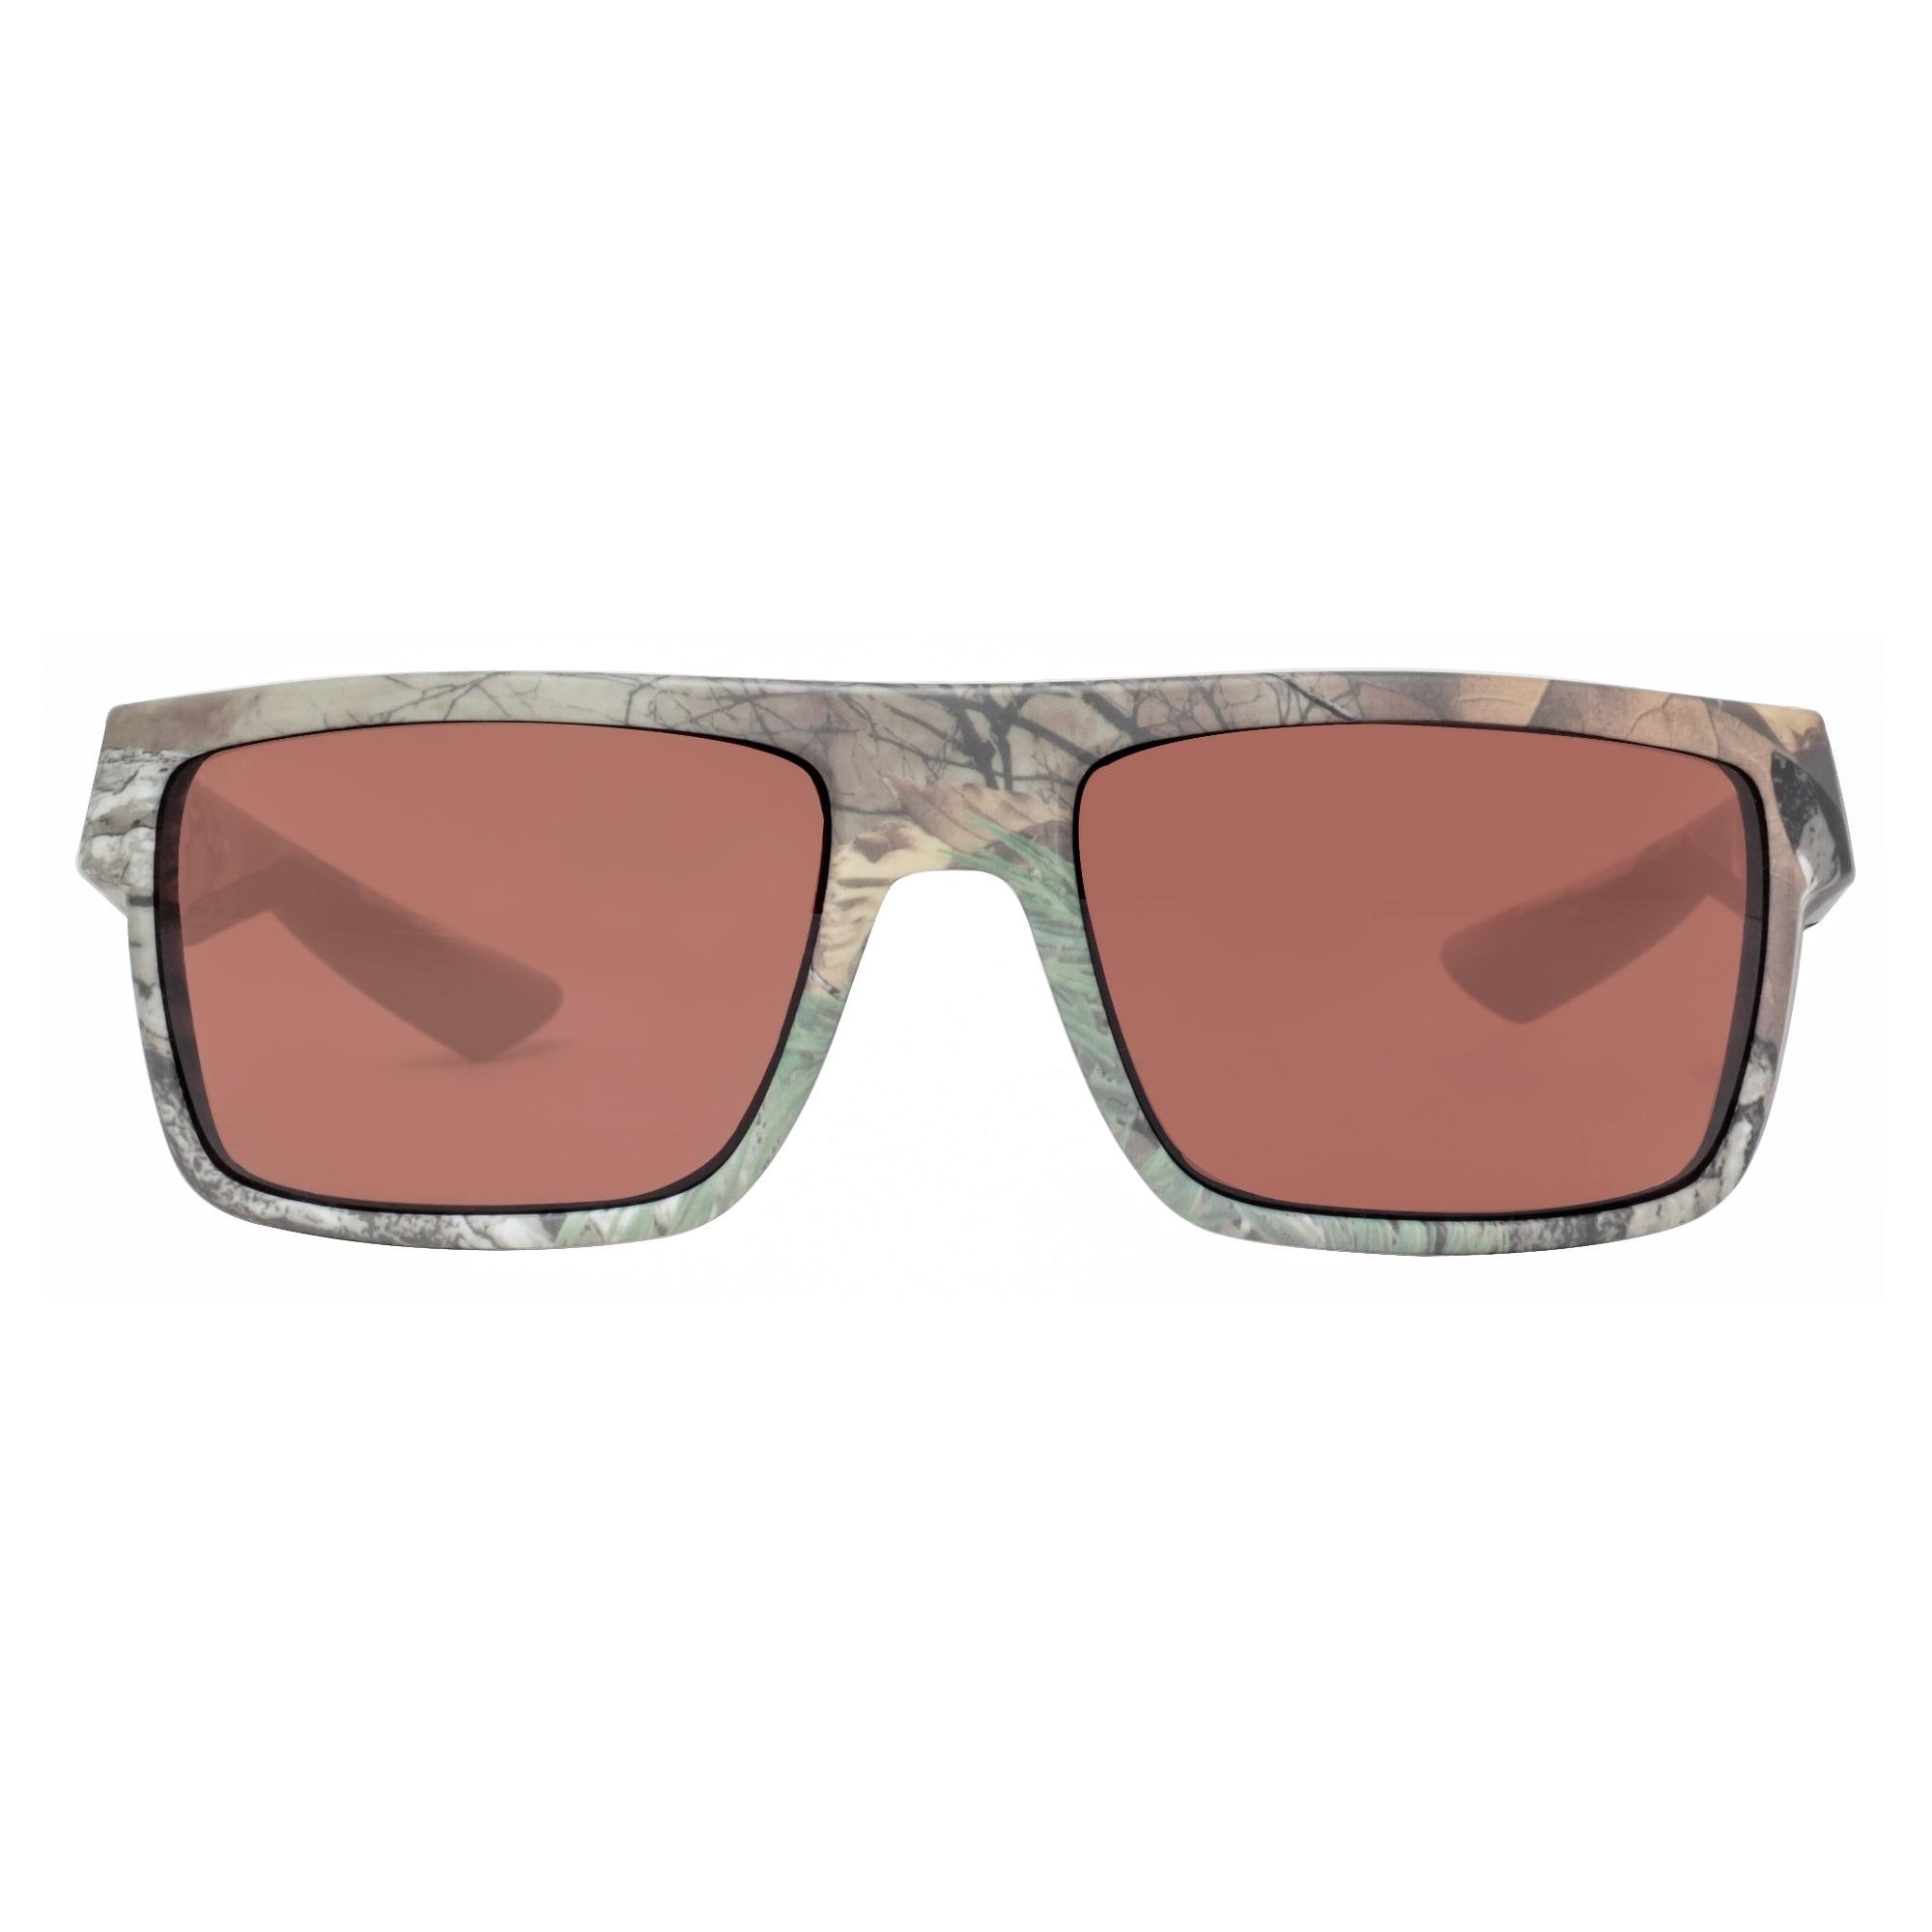 df20c697d53 Shop Costa Del Mar Motu MTU69OCP Realtree Xtra Camo 580P Brown Copper  Sunglasses - realtree xtra camouflage - 57mm-18mm-120mm - Free Shipping  Today ...